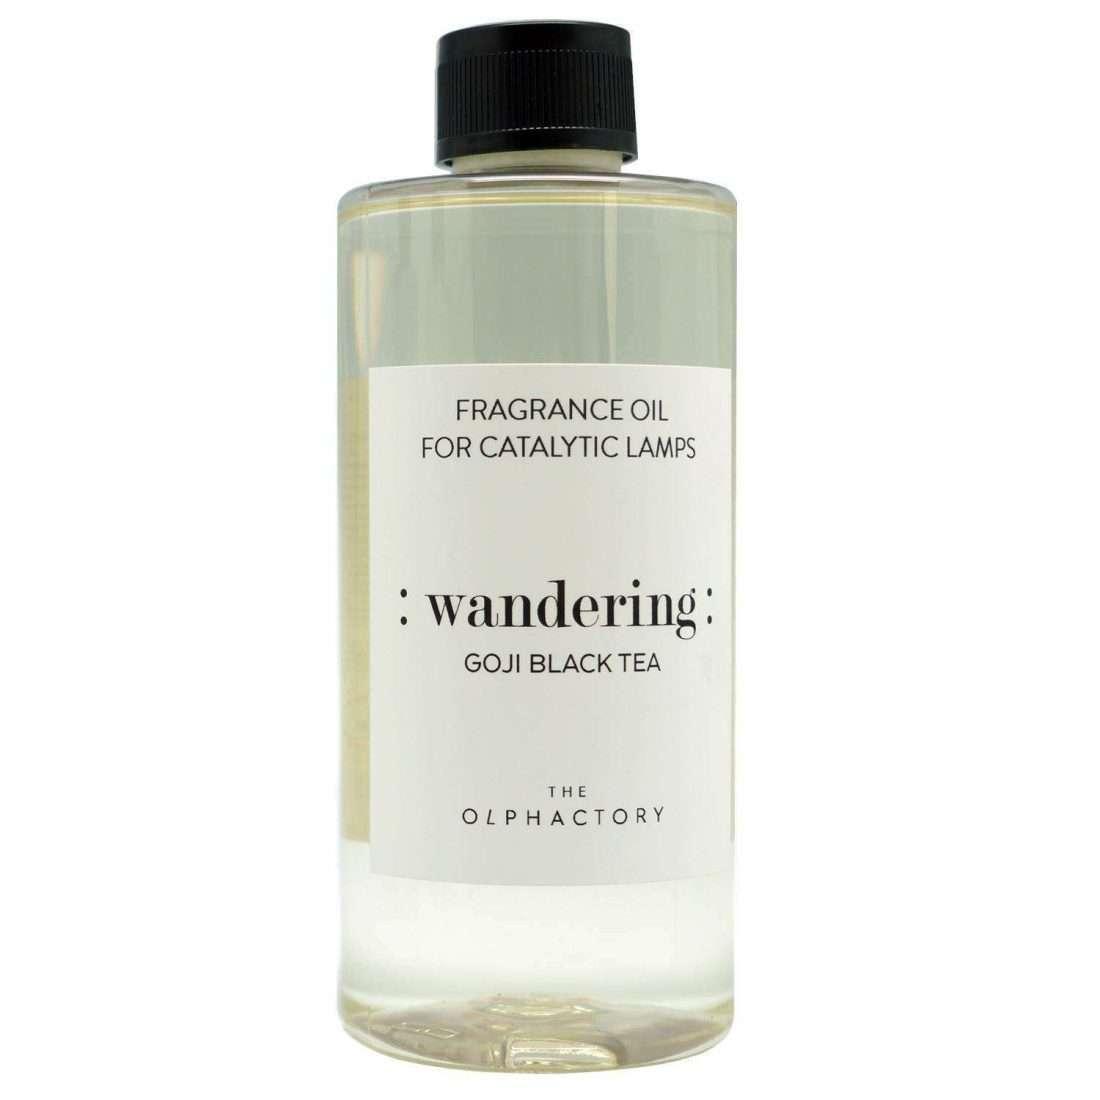 8435474420252 Lc500gjto Wandering Goji Black Tea